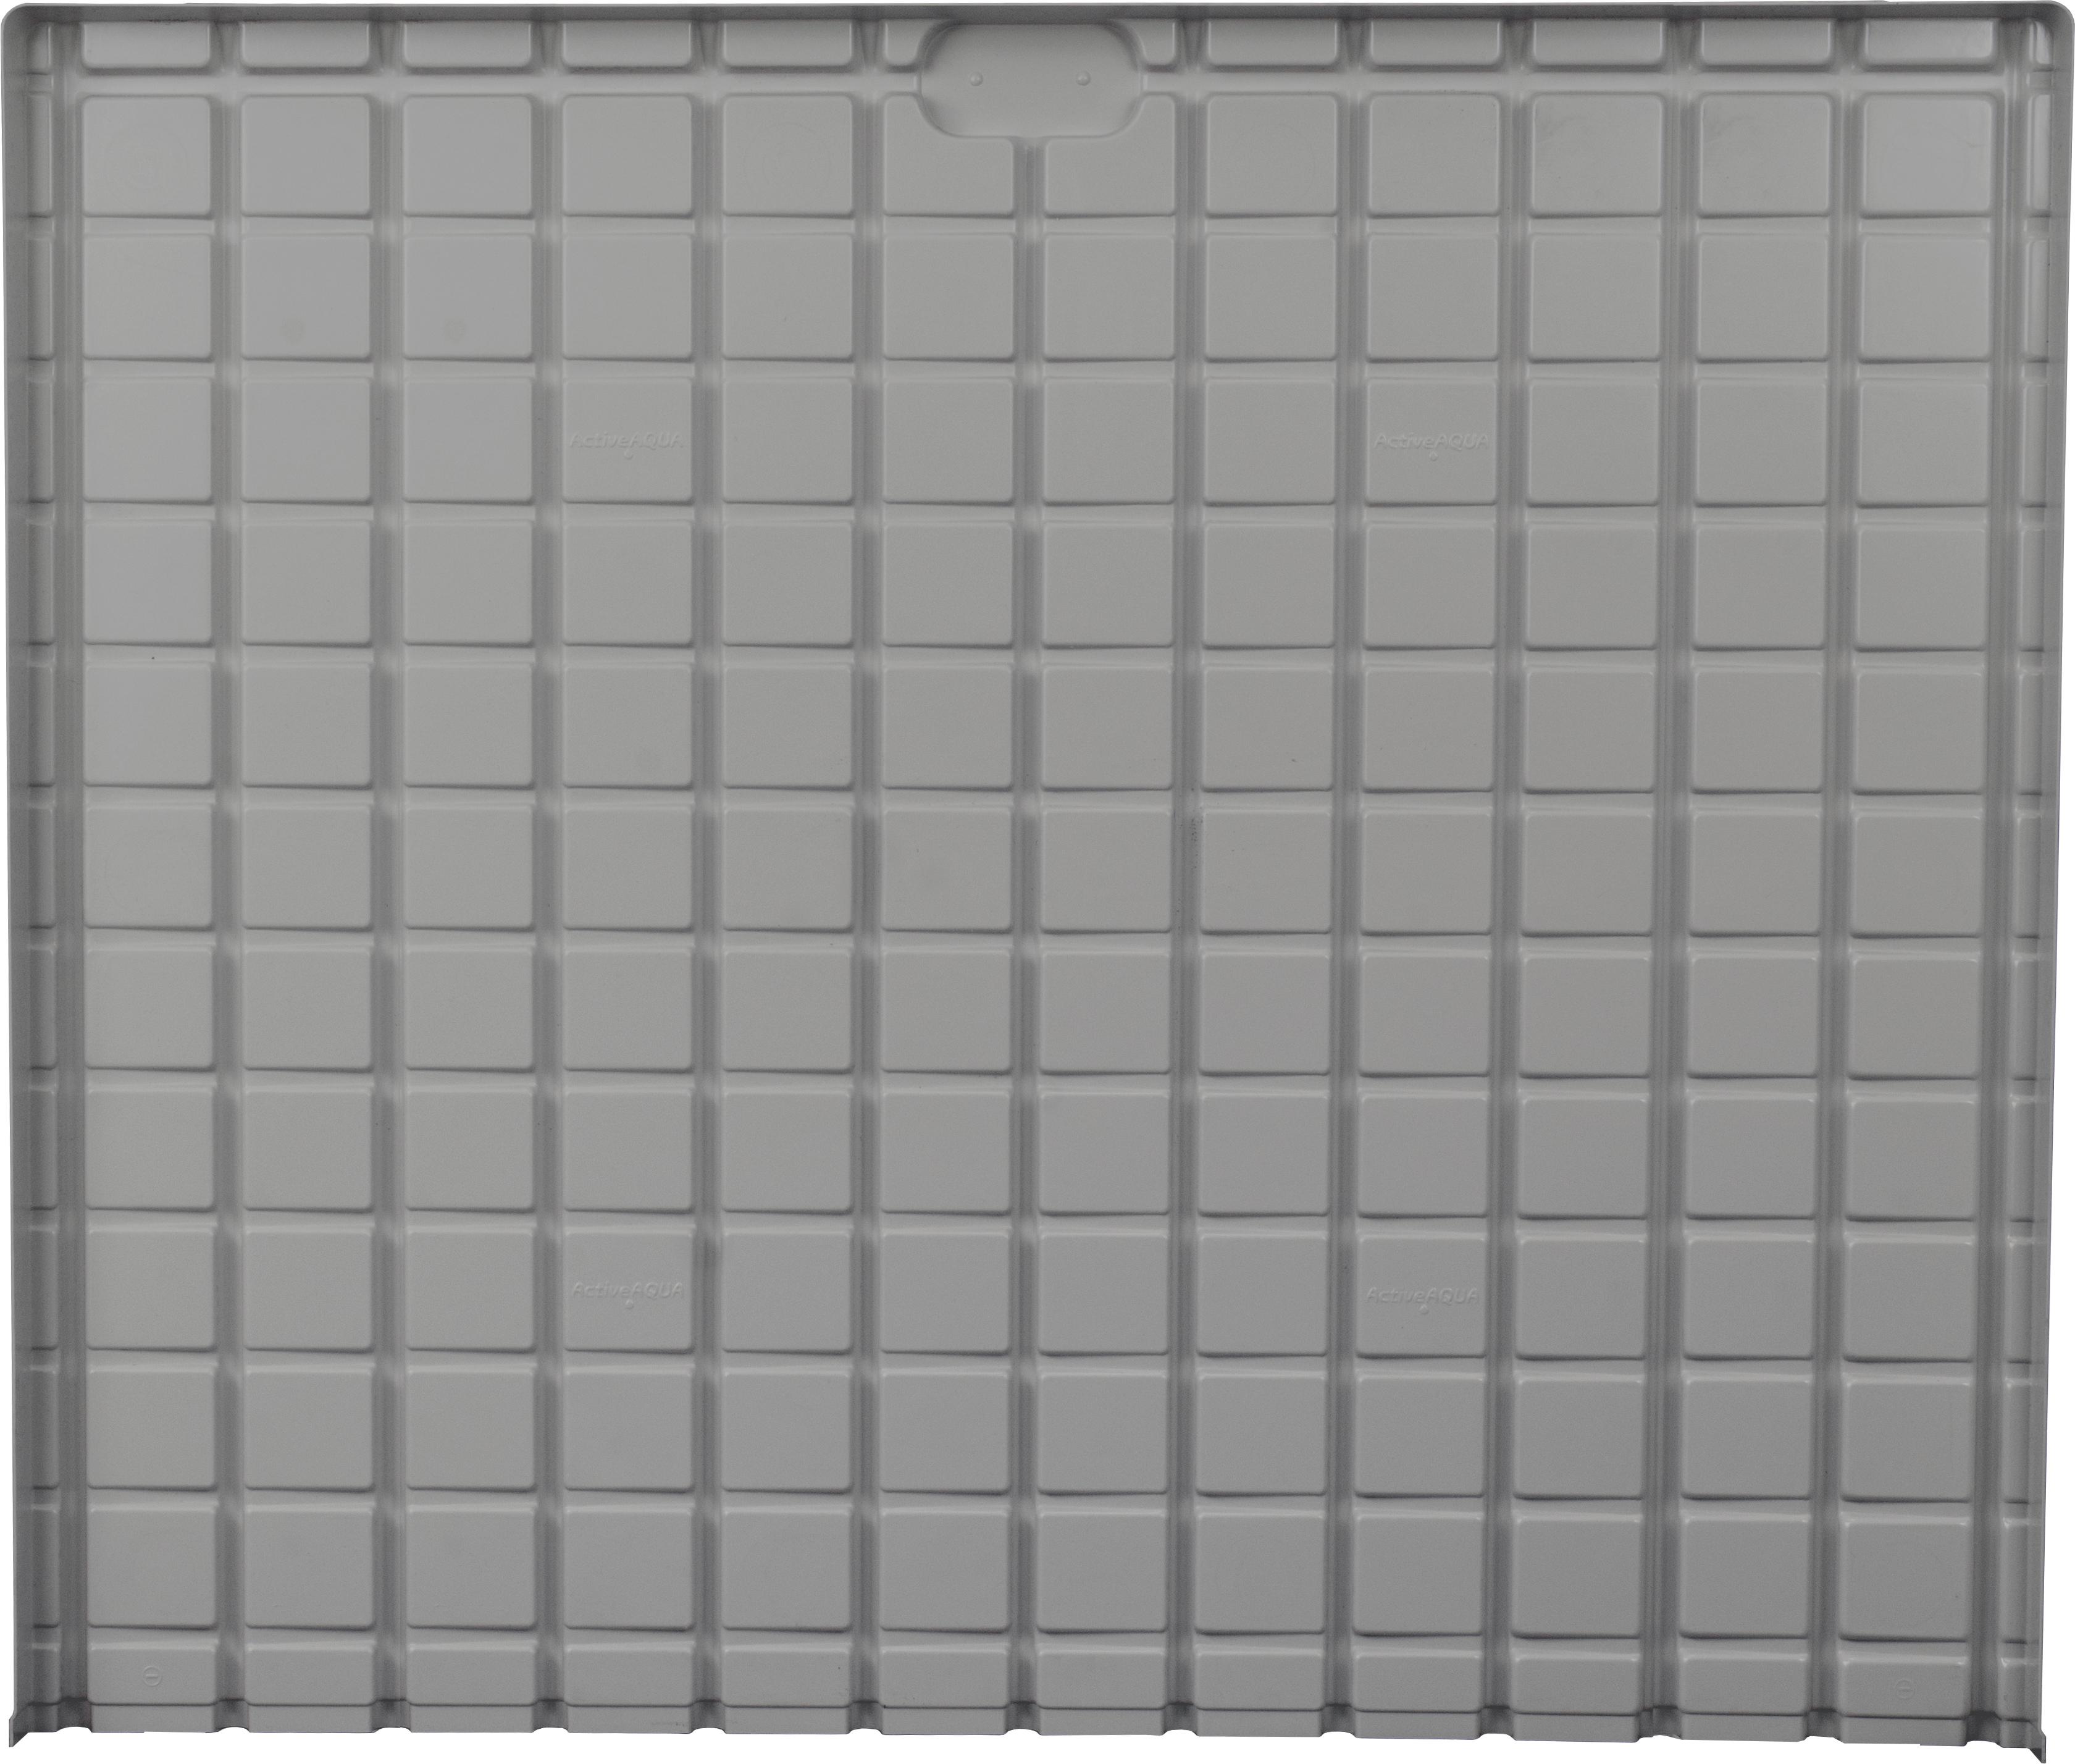 AA Infinity Tray End, Gray, 6.5'x5' Minus (-)